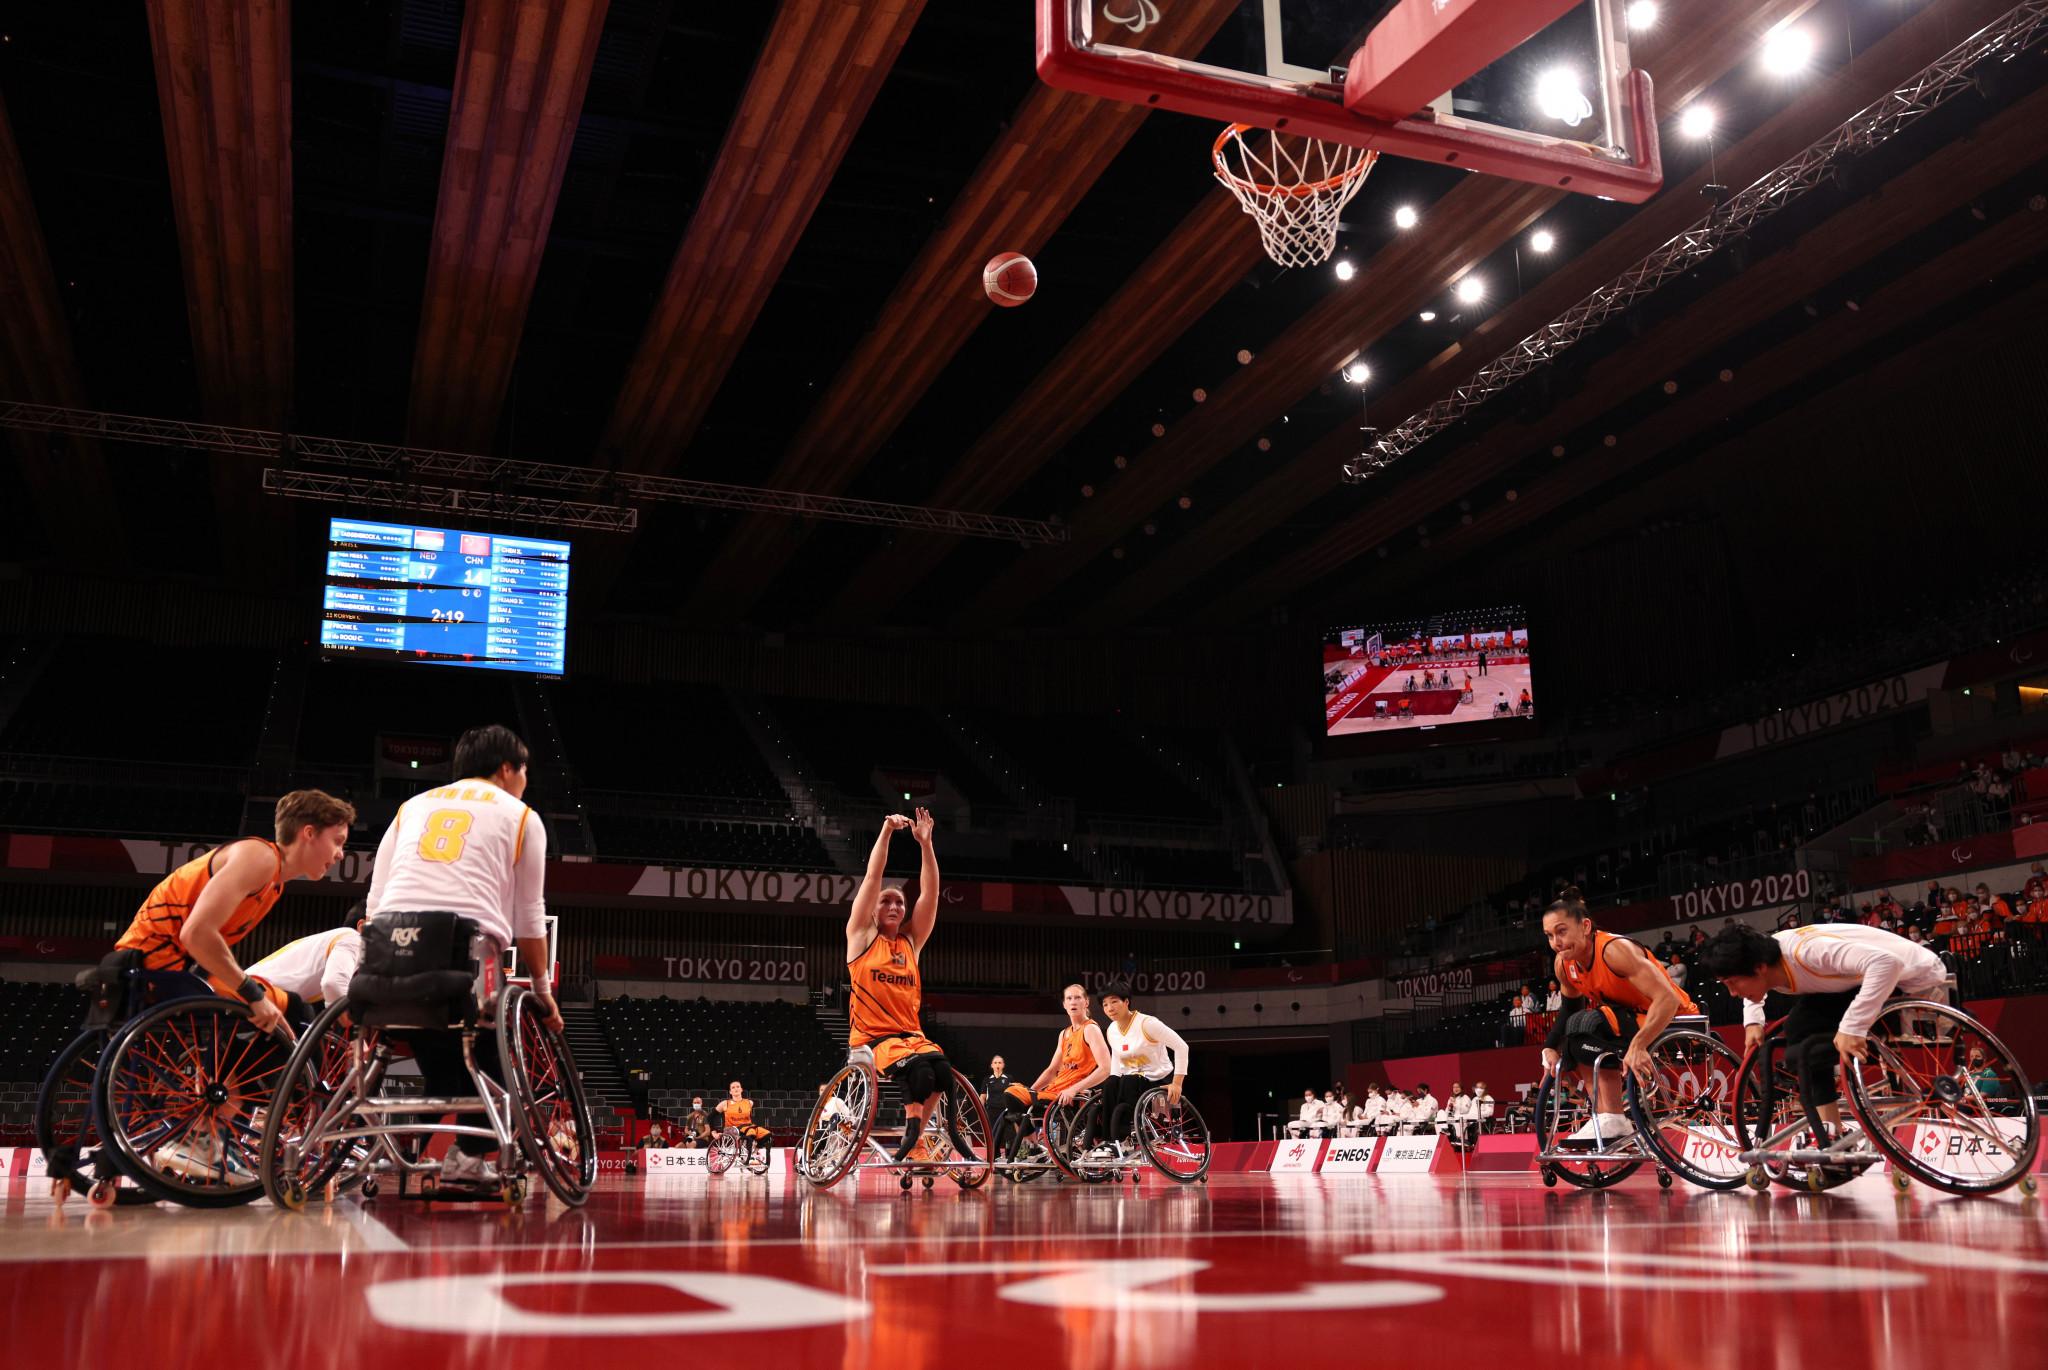 The Netherlands win maiden women's wheelchair basketball gold at Tokyo 2020